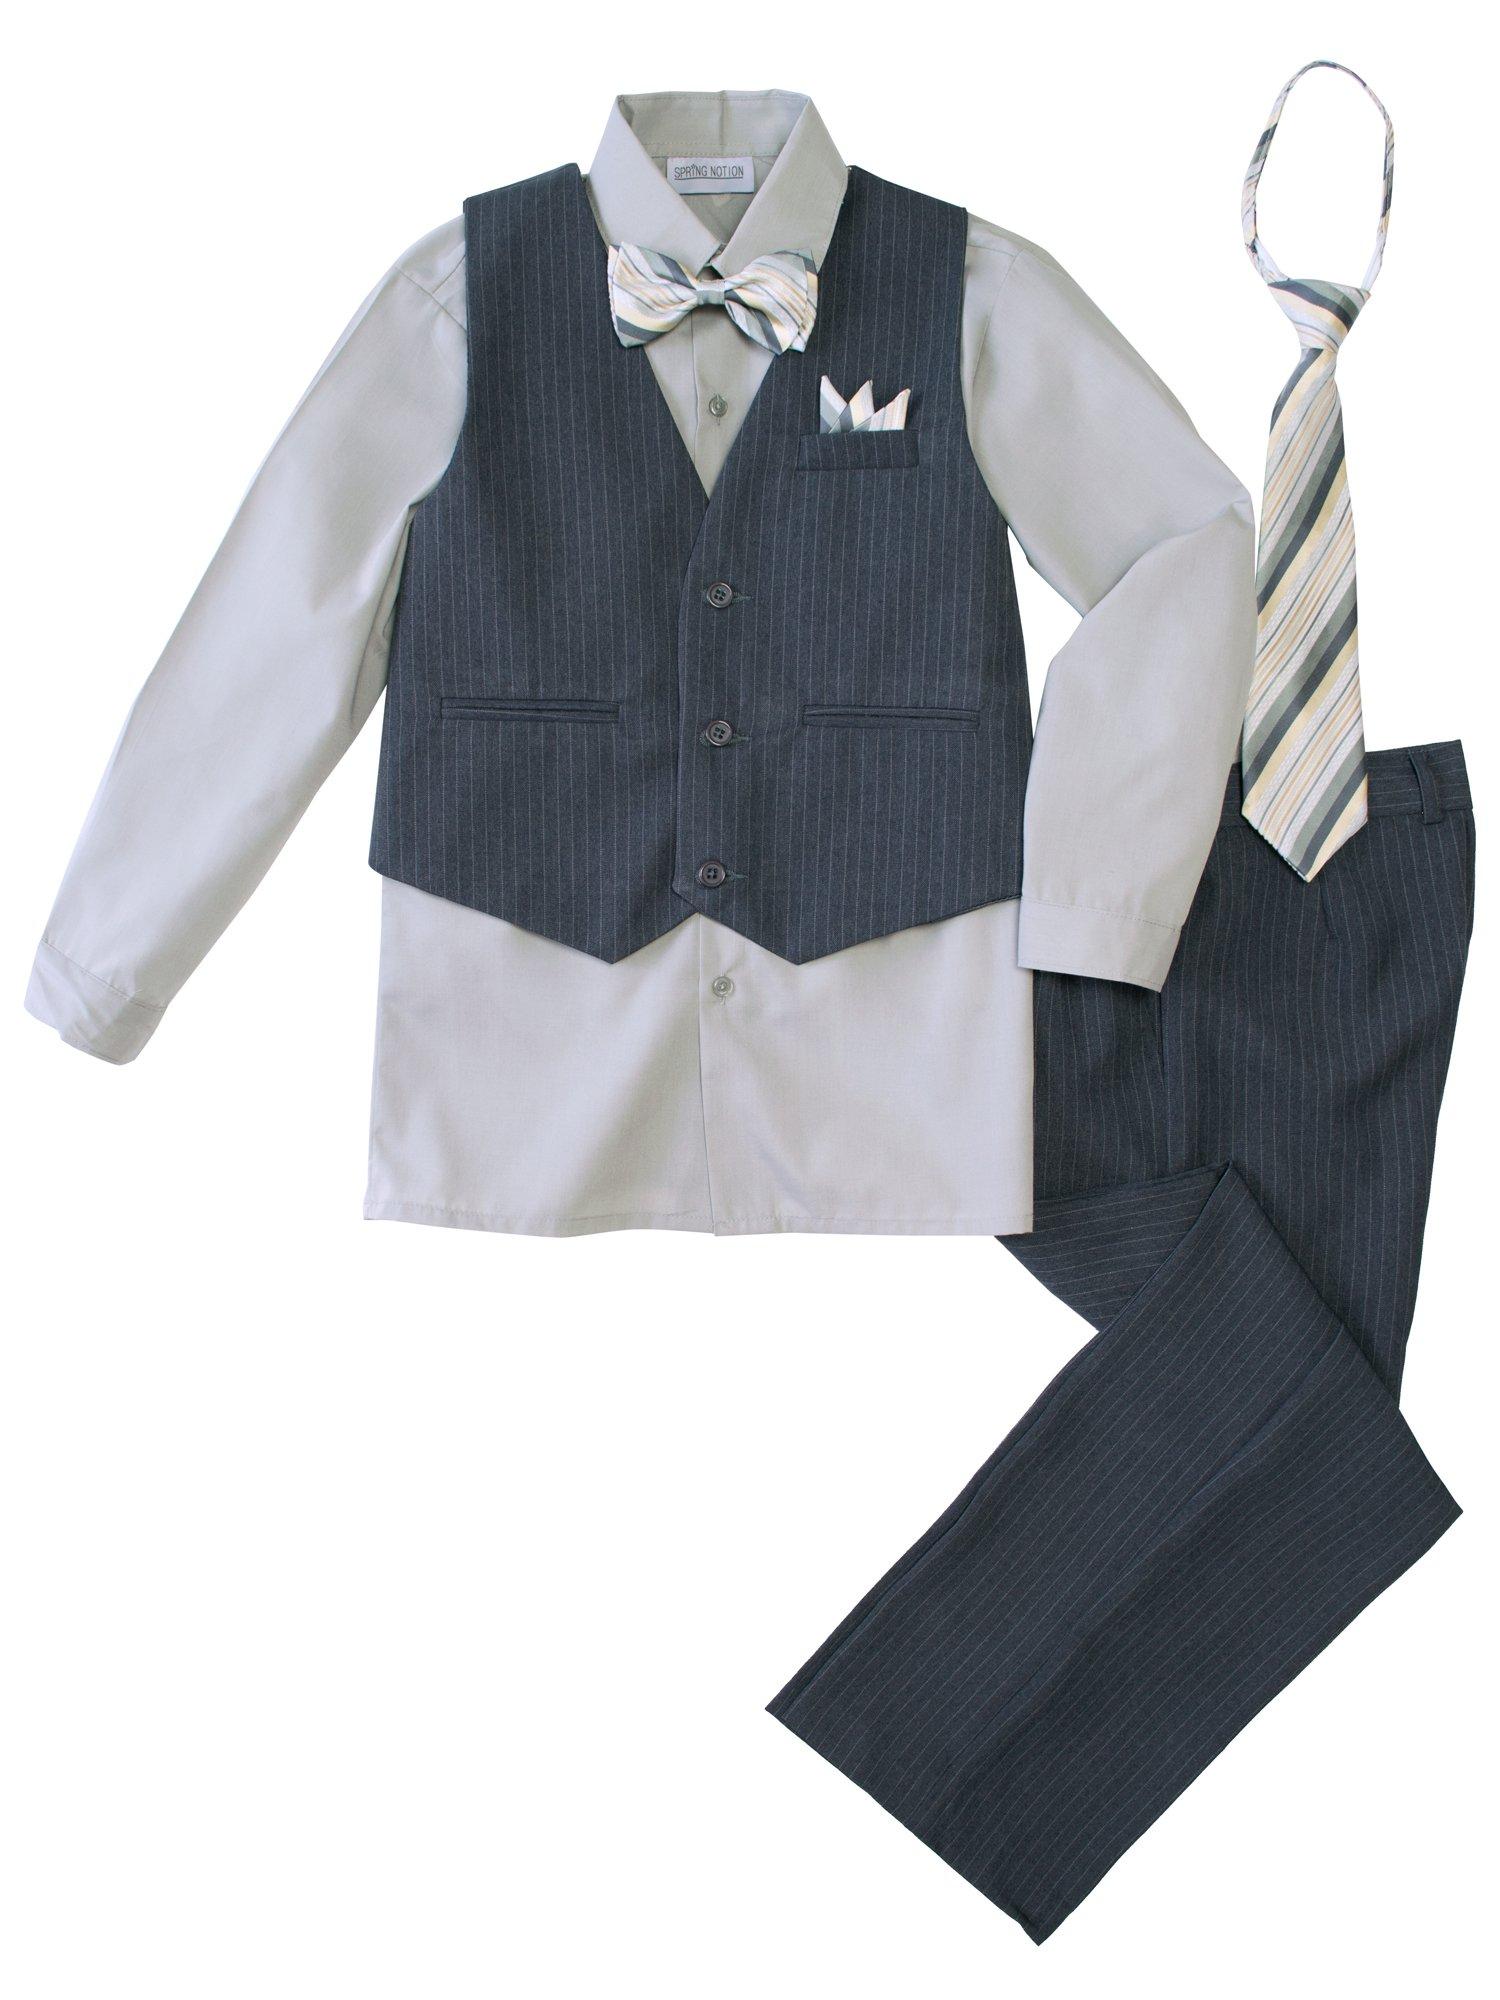 Spring Notion Big Boys' 5 Piece Pinstripe Vest Set with Necktie and Bowtie 2T Grey